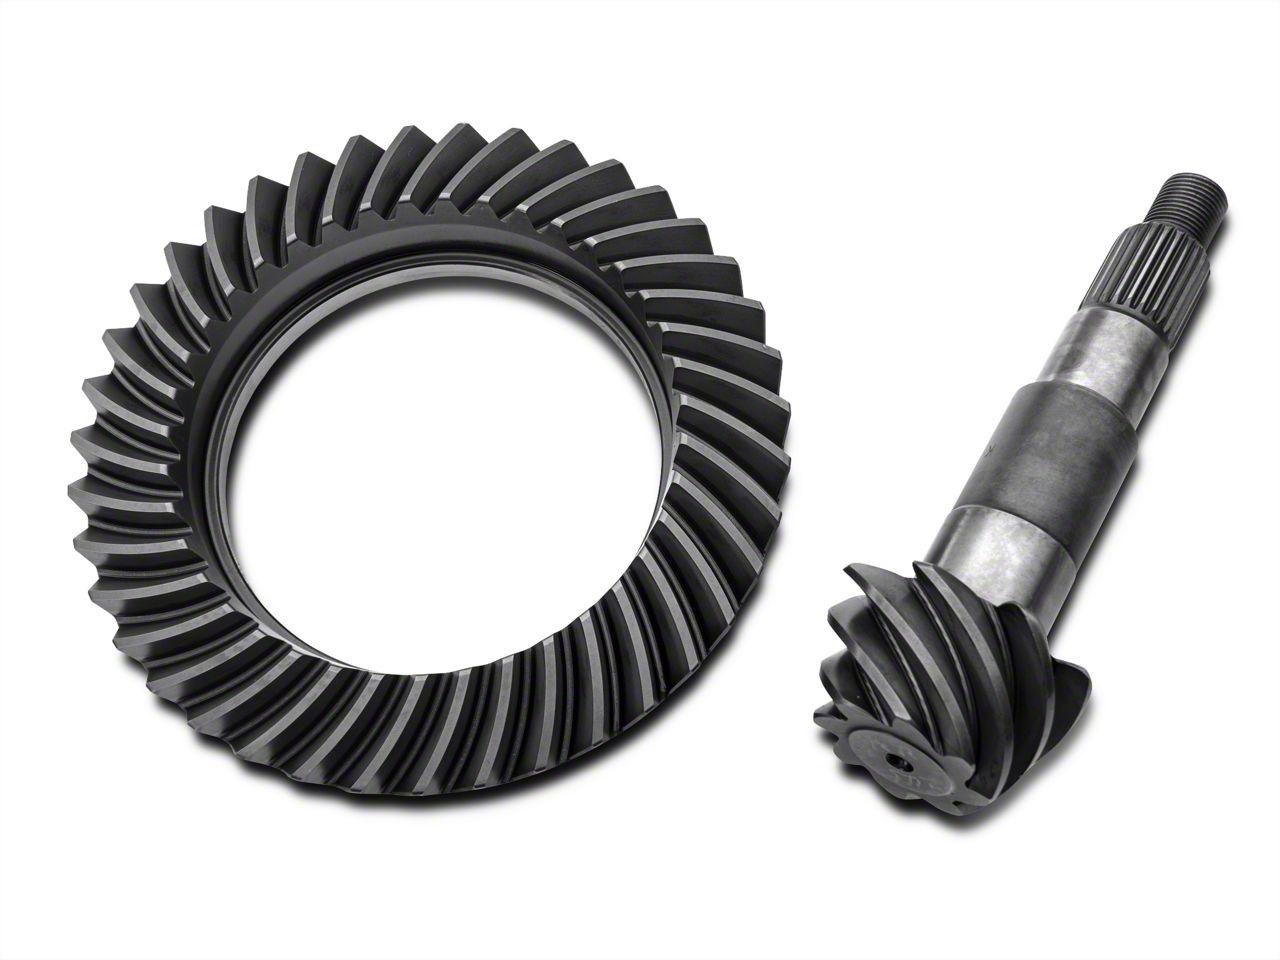 Yukon Gear Dana 44 Rear Ring Gear and Pinion Kit - 4.88 Gears (07-18 Jeep Wrangler JK)